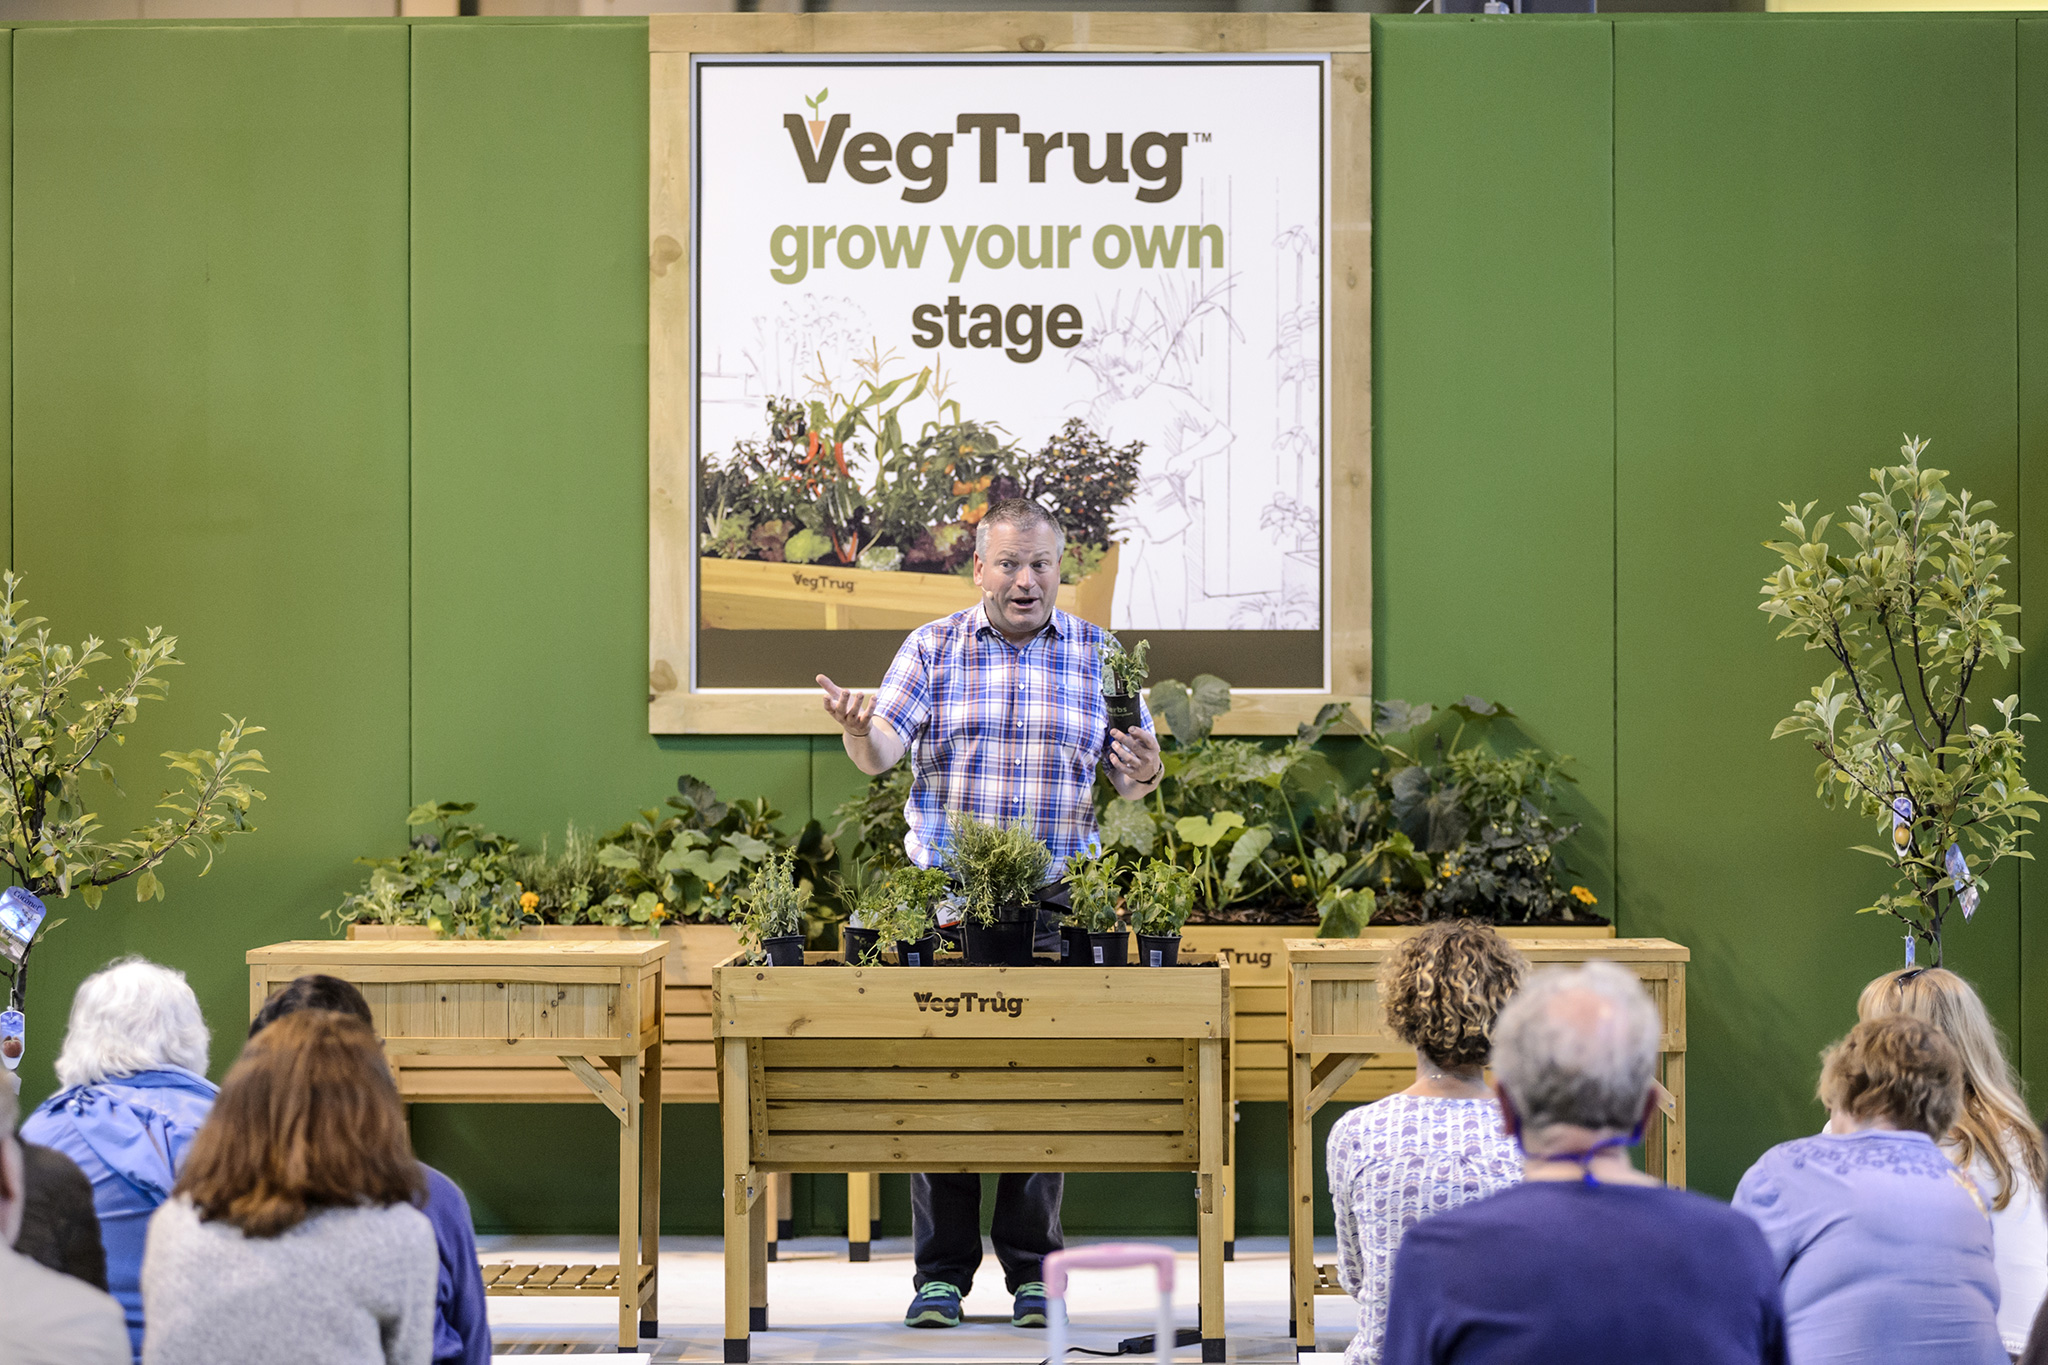 vegtrug-grow-your-own-stage-2